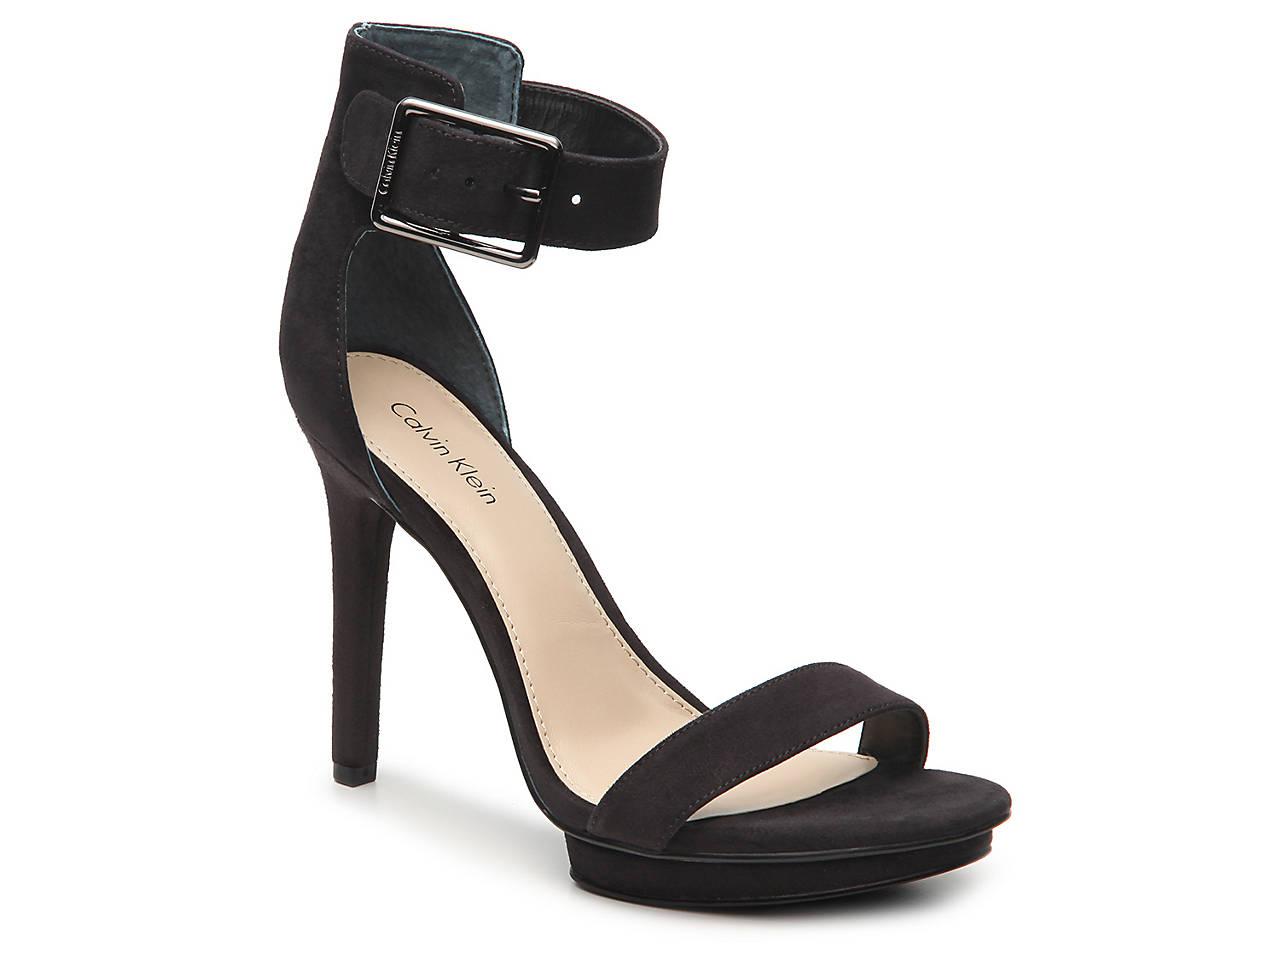 65eeb798392 Calvin Klein Vivian Platform Sandal Women s Shoes